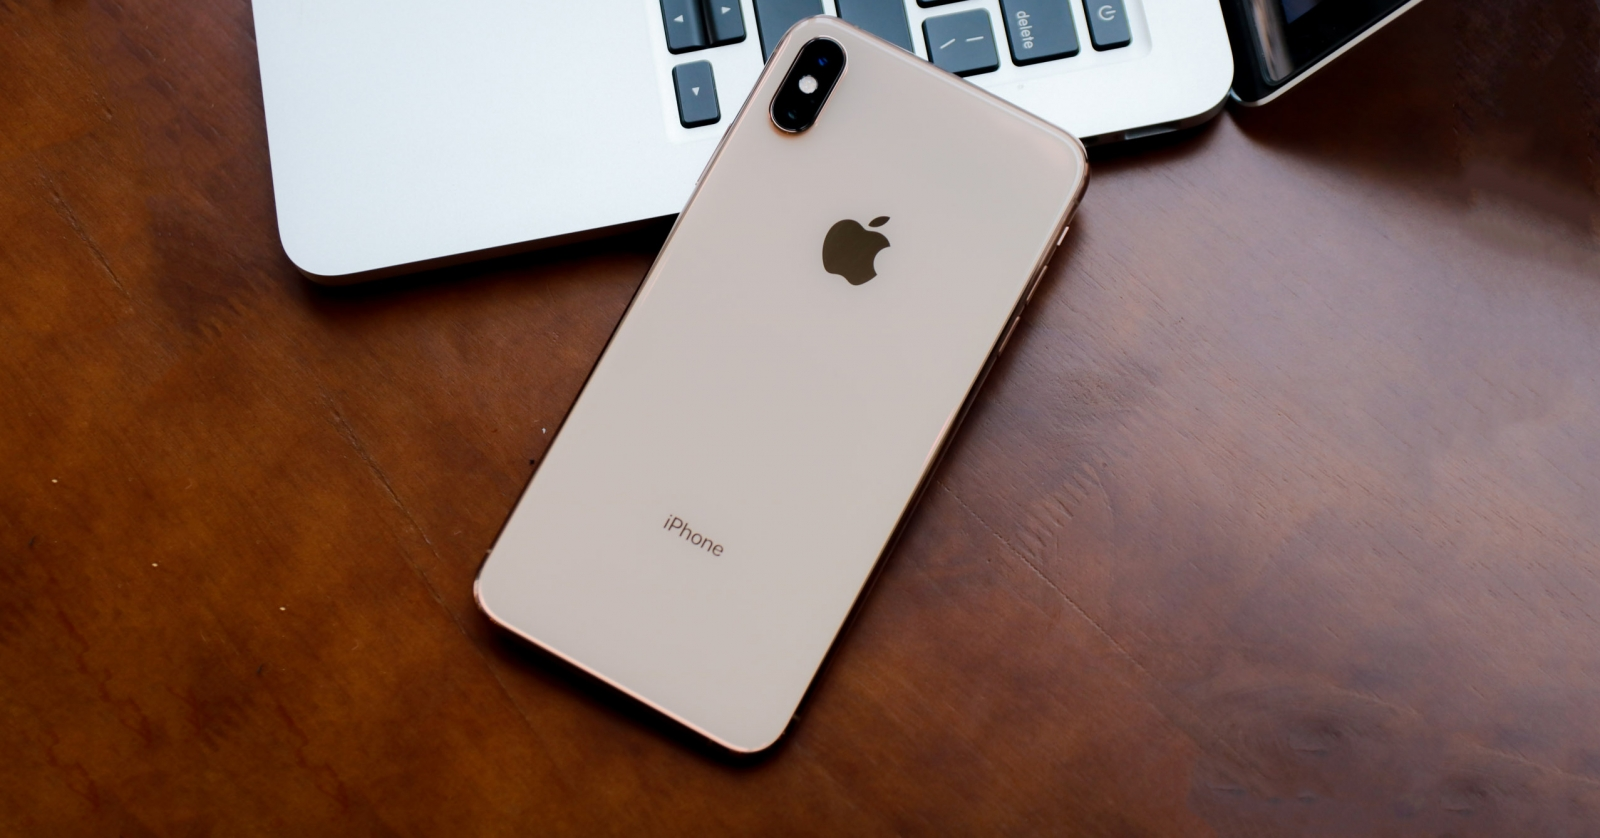 iPhone XS Max 1 sim